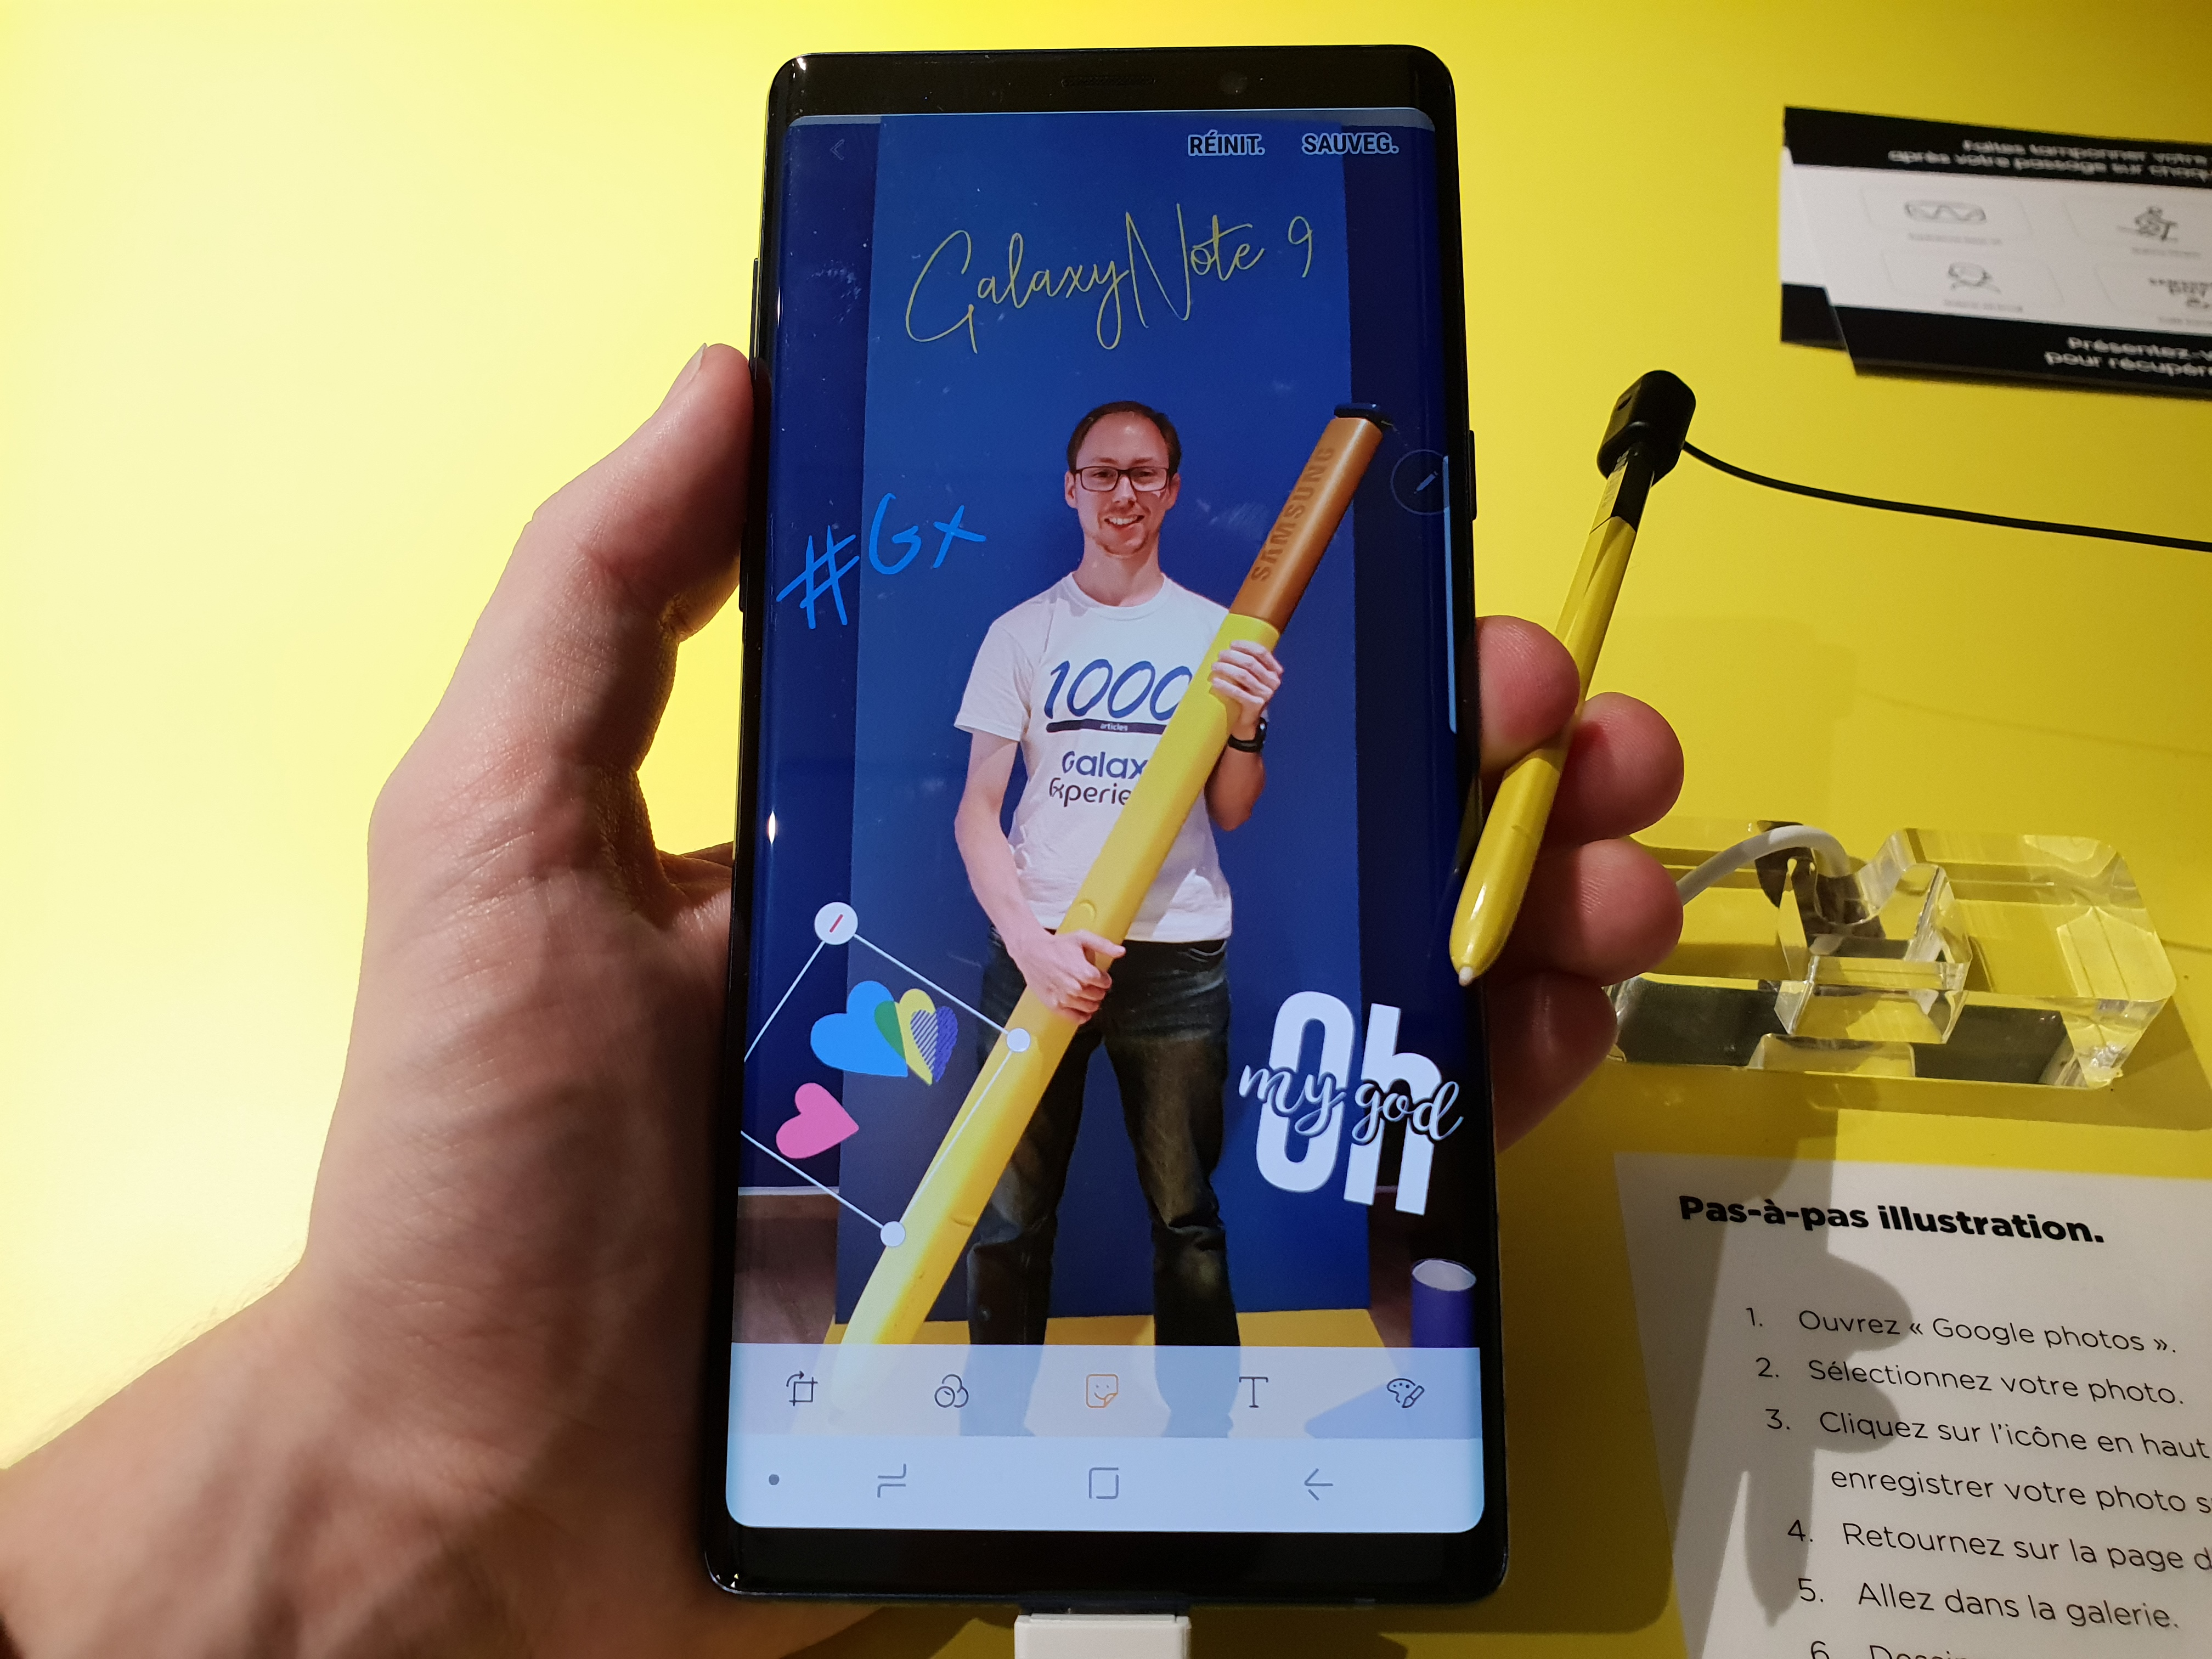 #SamsungParis - Galaxy Note 9 - Illustrations